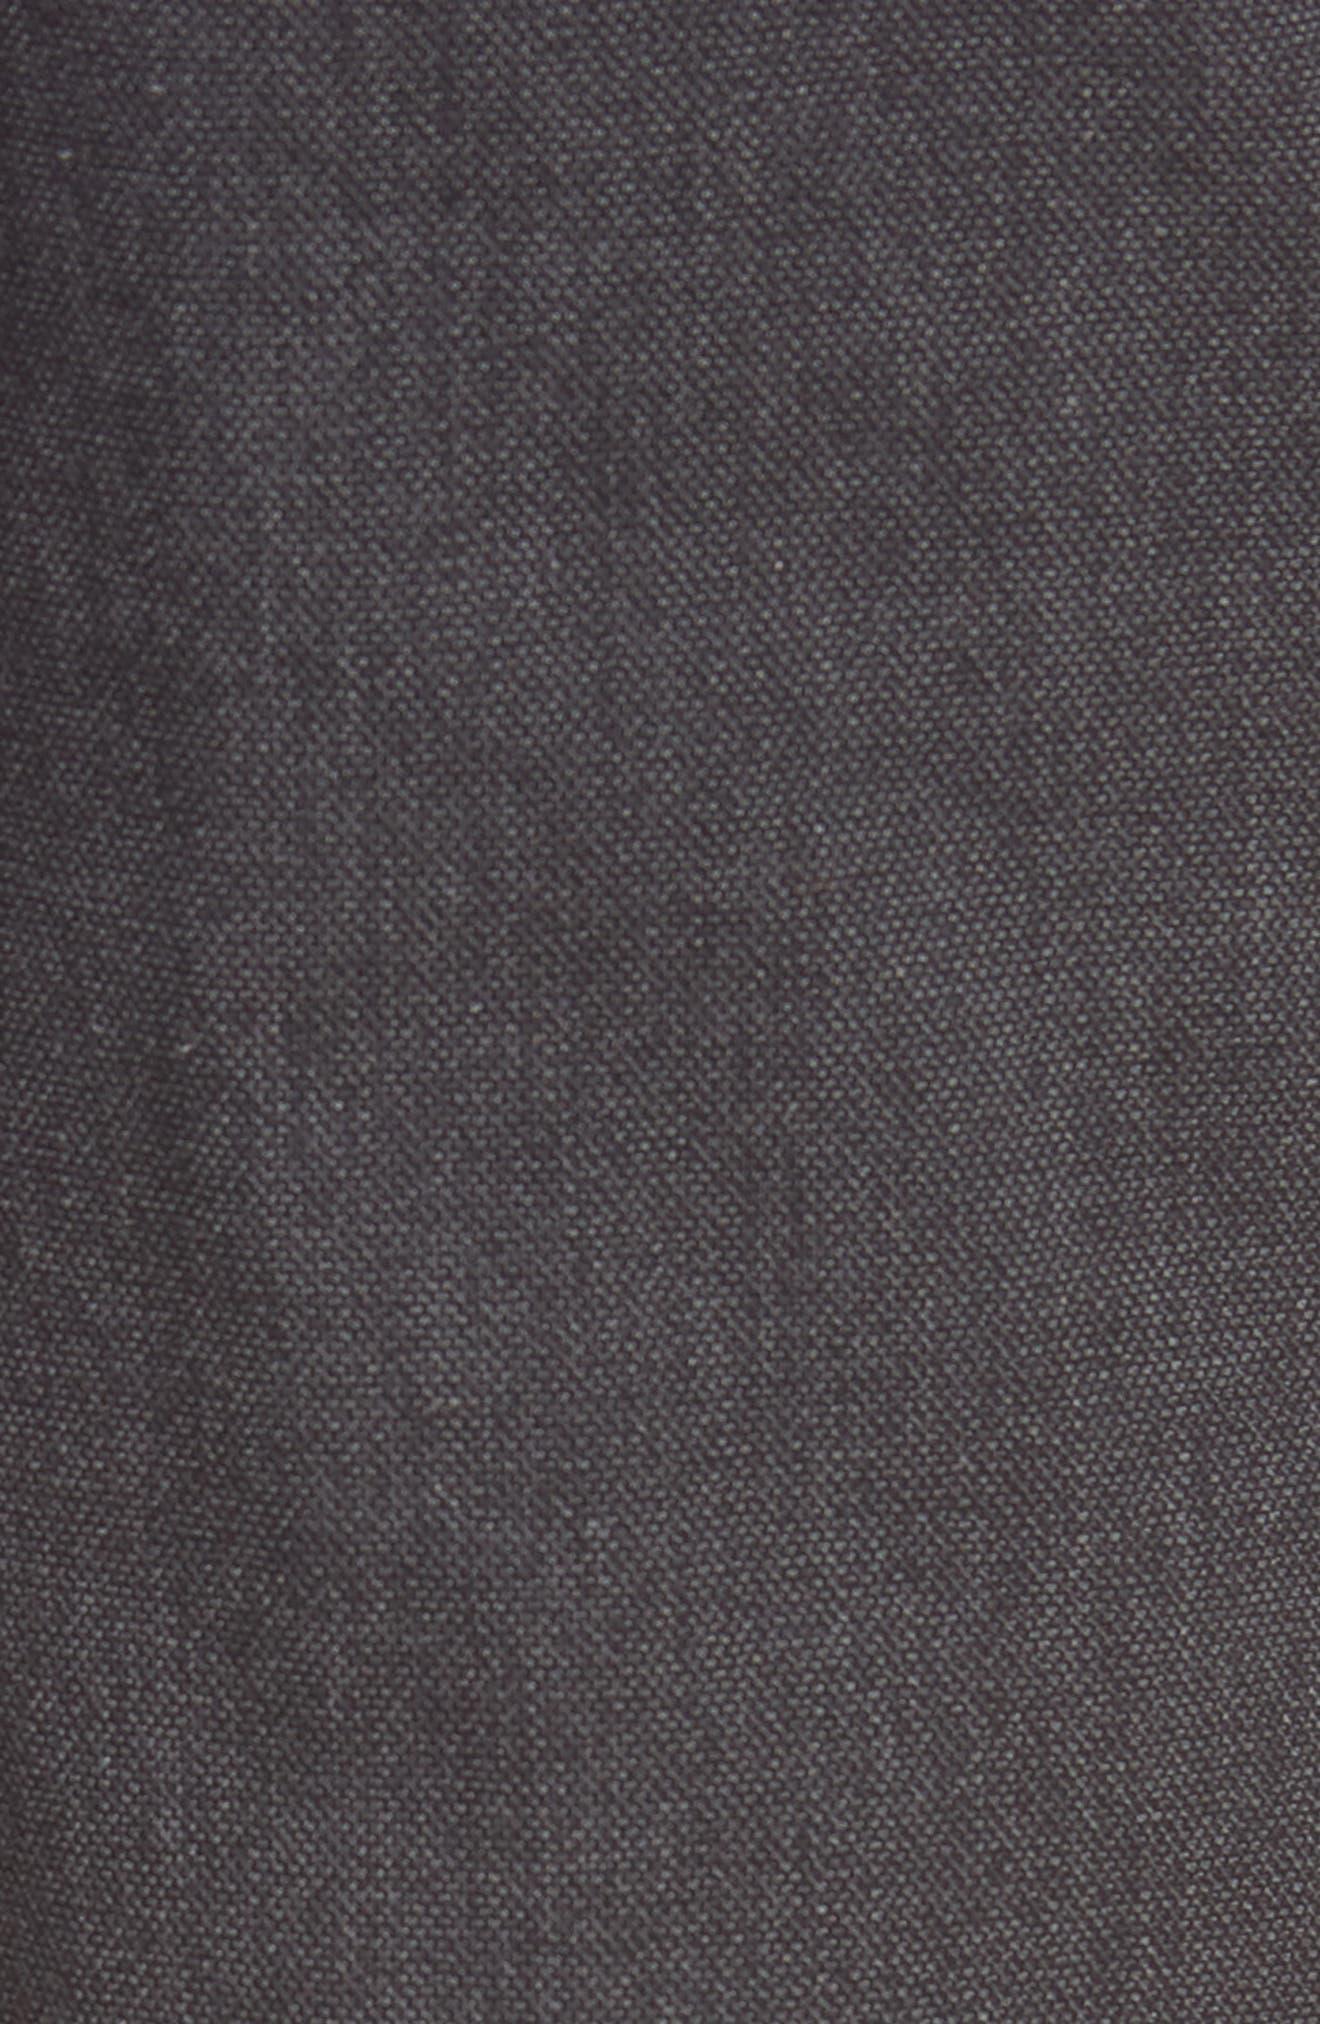 Batho Flat Front Solid Cotton Trousers,                             Alternate thumbnail 5, color,                             MEDIUM GREY